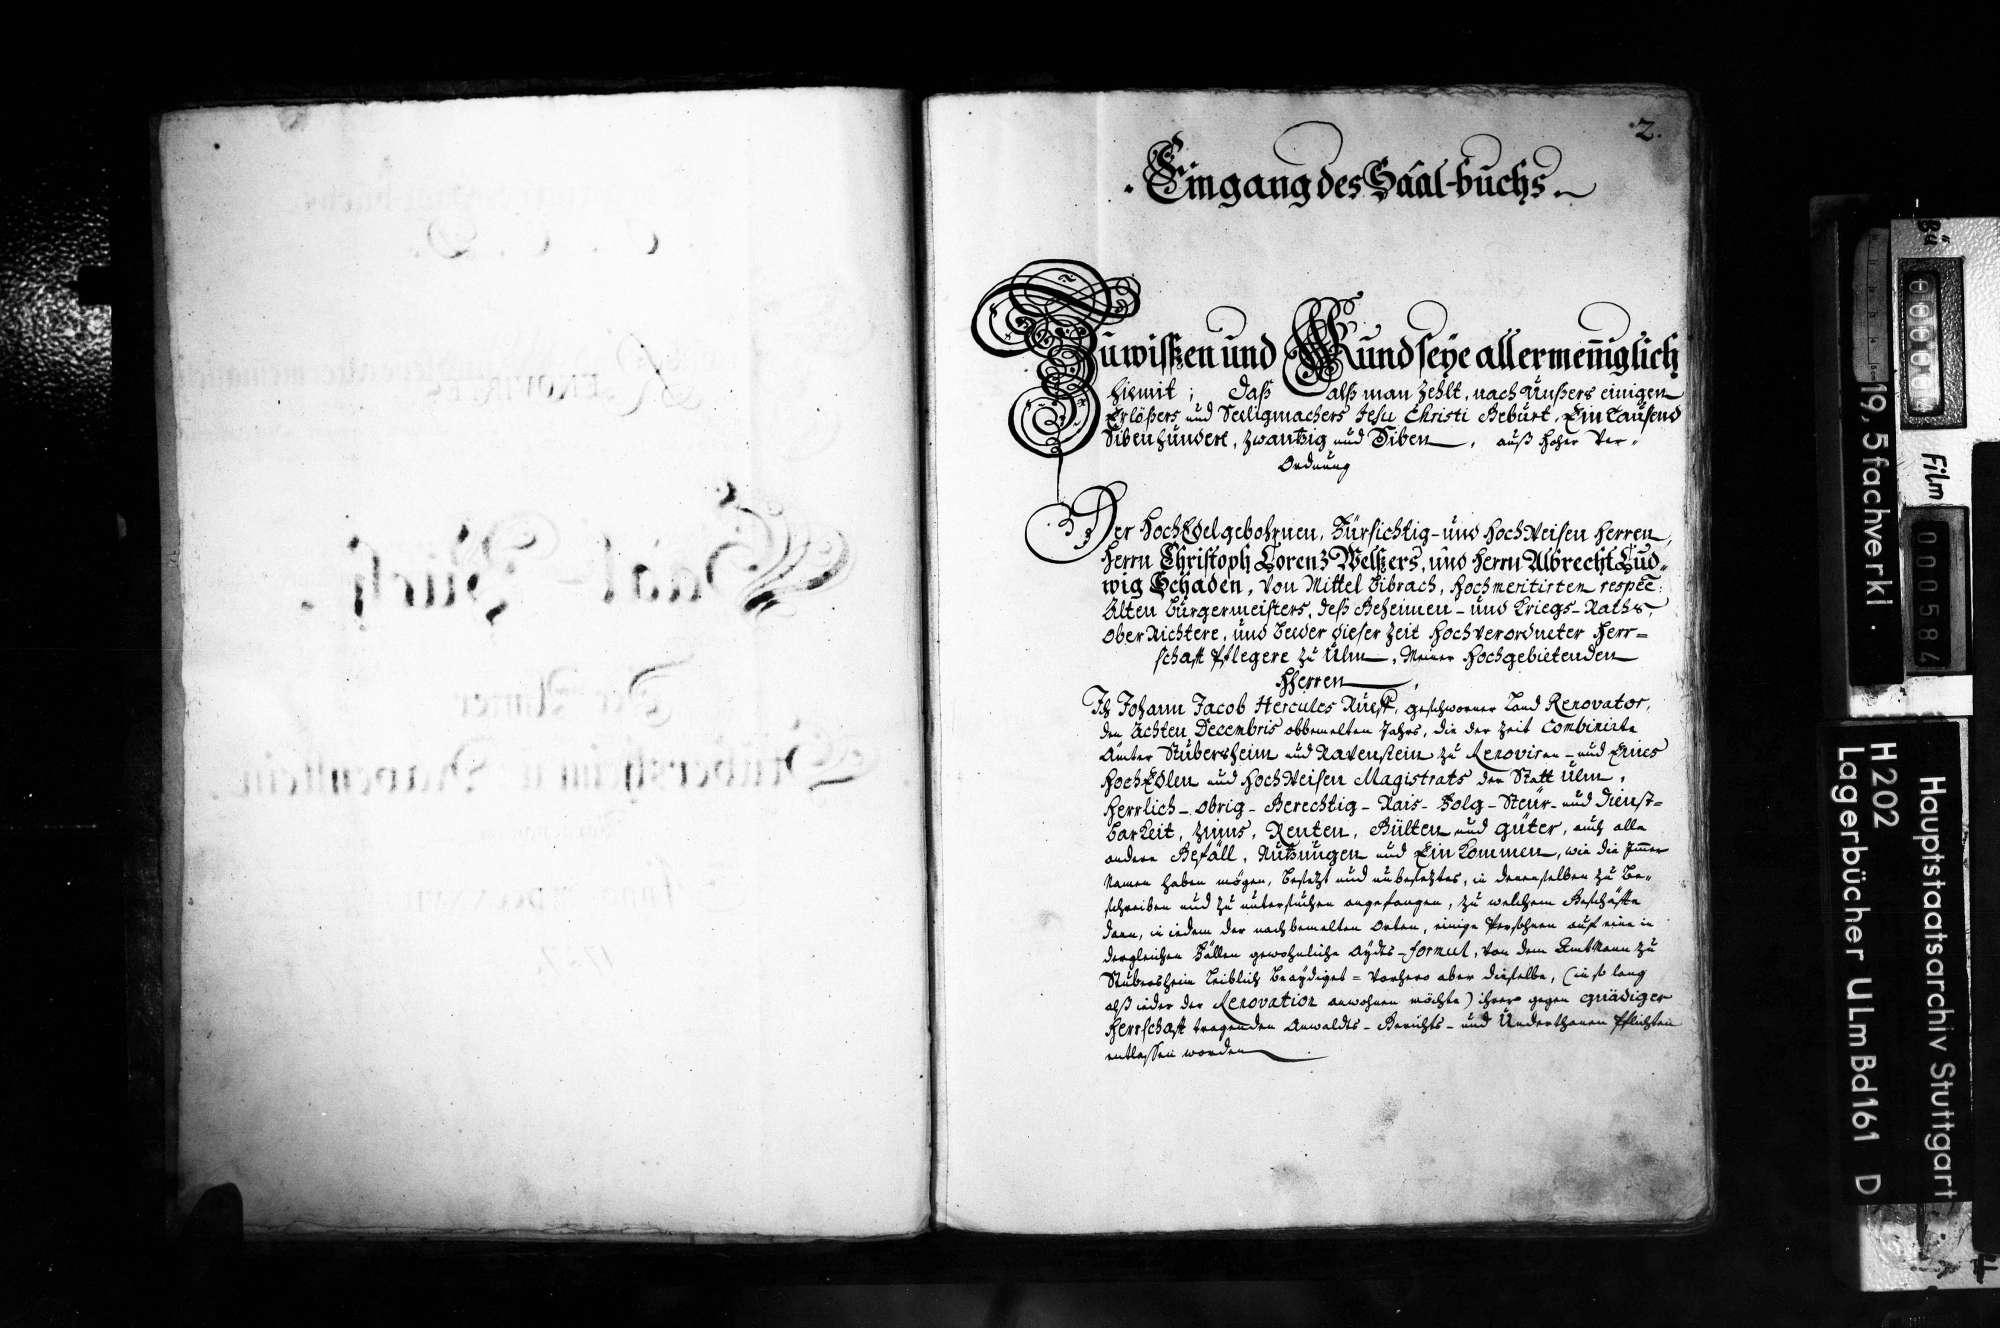 Stubersheim – Schalkstetten 1. Bd., Bild 3